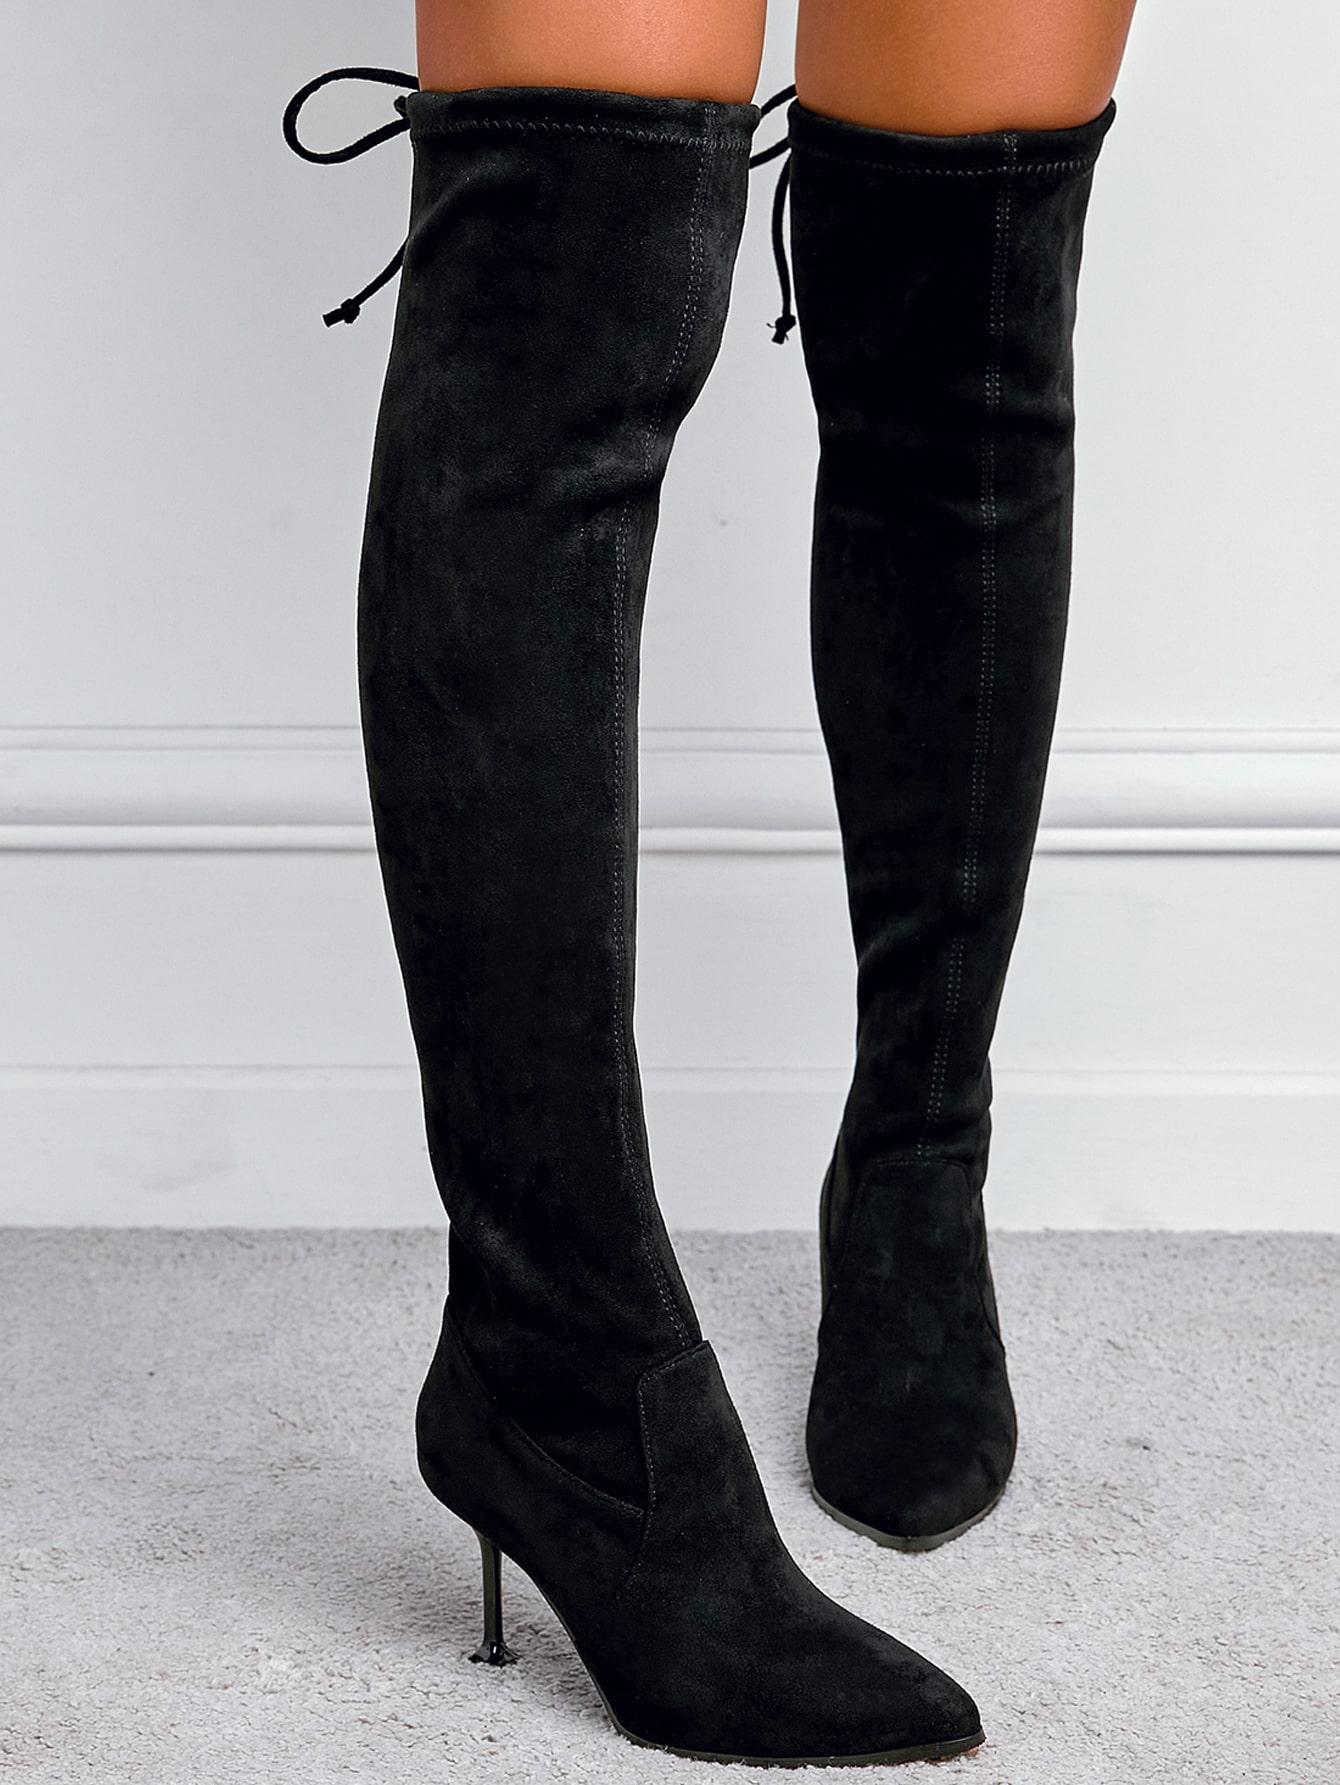 Point Toe Stiletto Heeled Knee Sock Boots